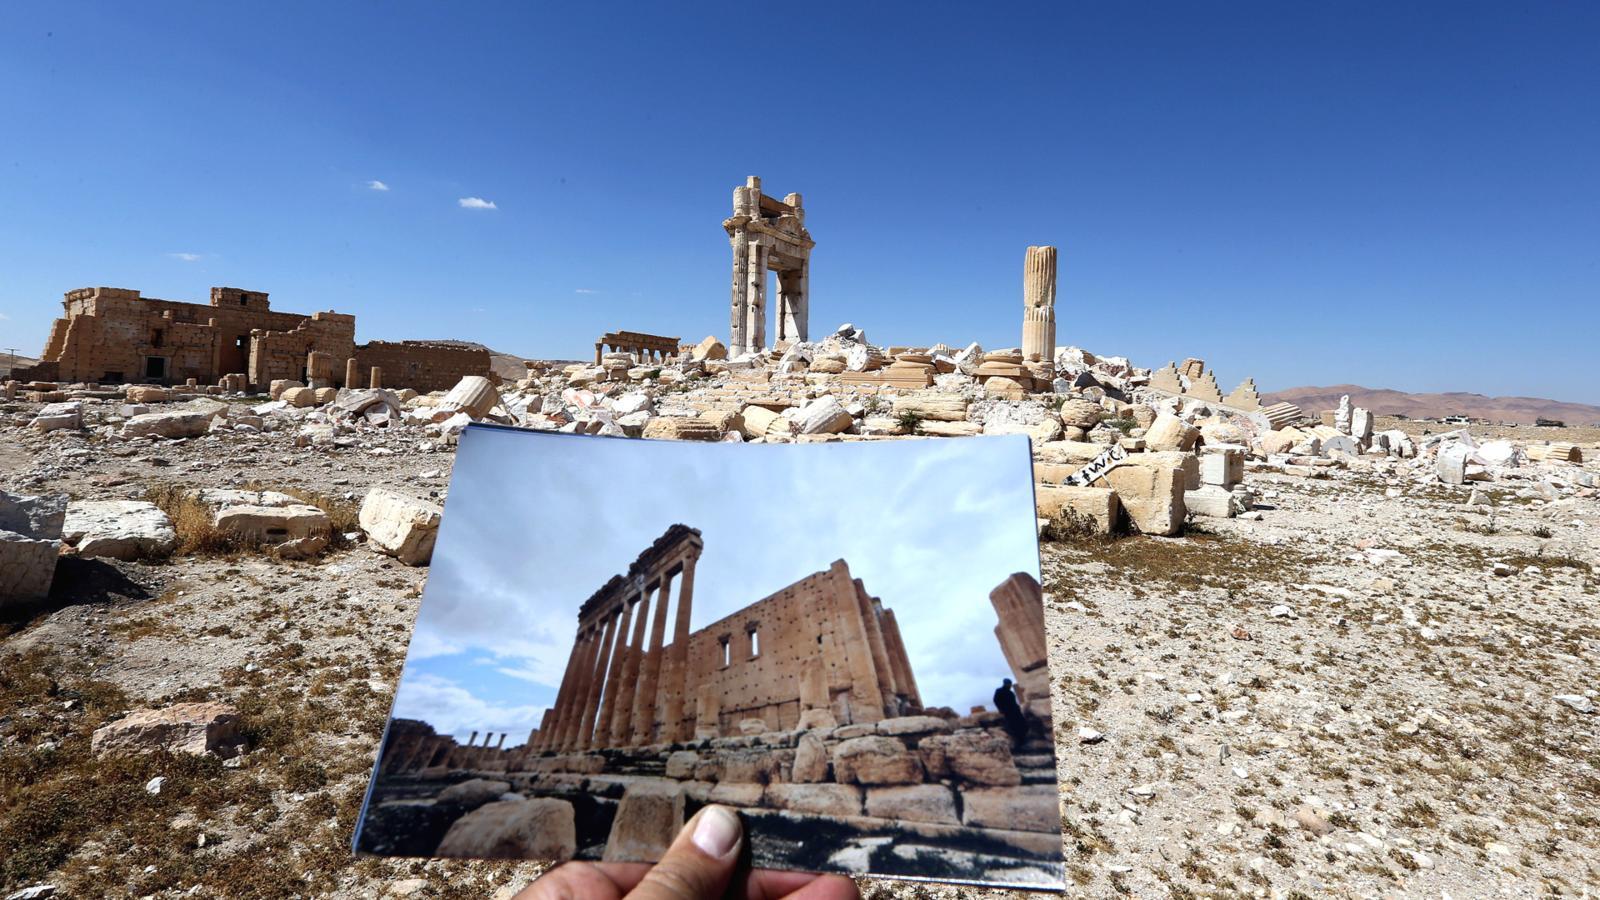 004 - SYRIA-CONFLICT-HERITAGE-PALMYRA